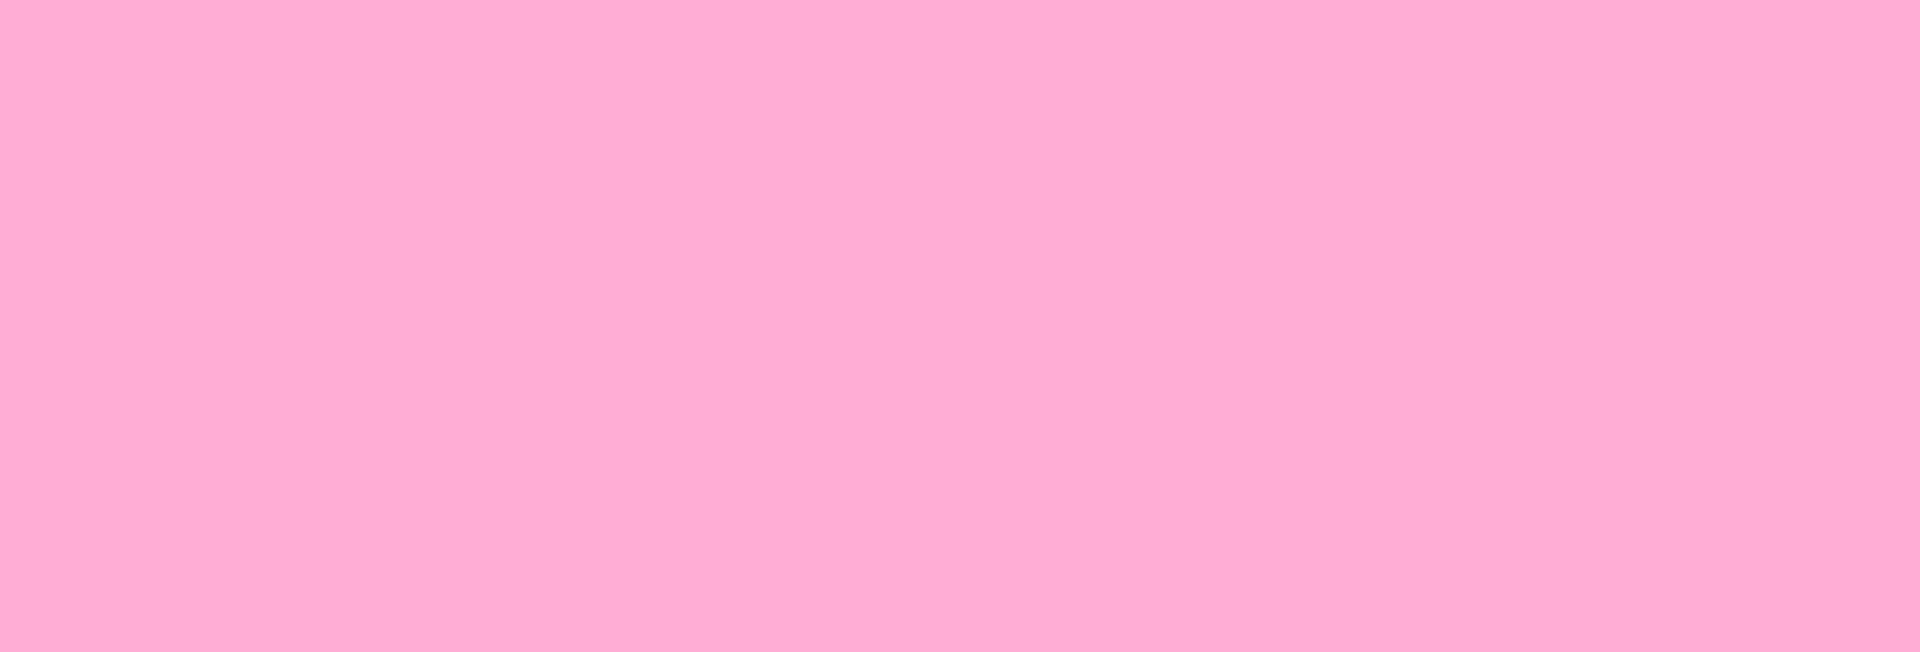 https://www.silberwerk.de/media/image/b1/20/94/KategorieBanner_Gutschein_farbe_rosa2_hell.jpg